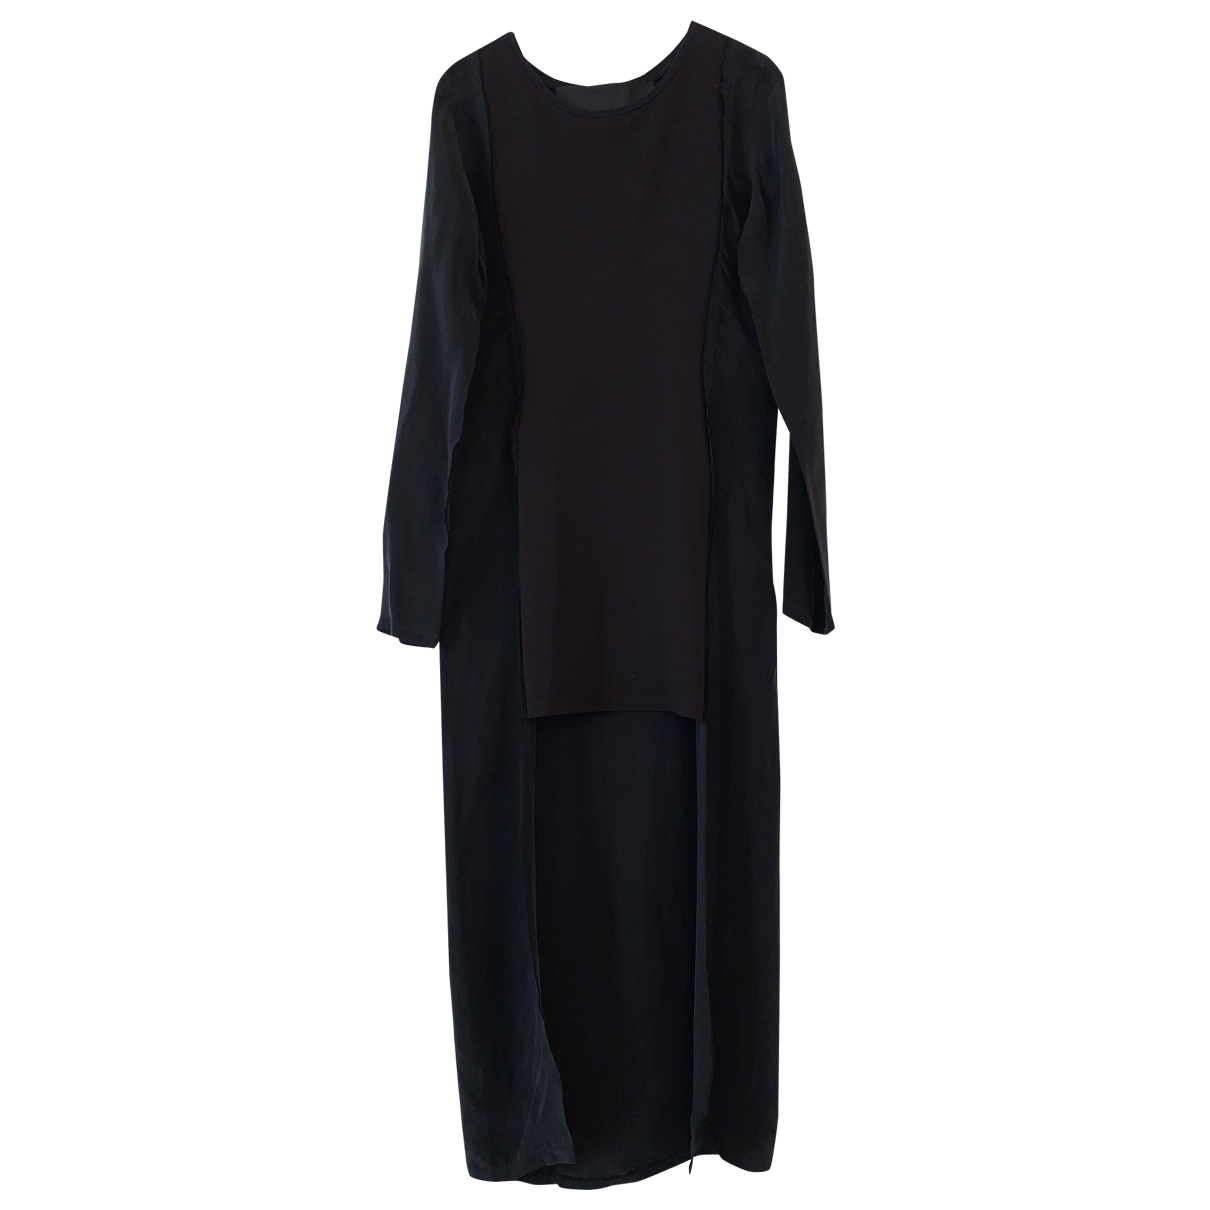 Avelon \N Kleid in  Schwarz Baumwolle